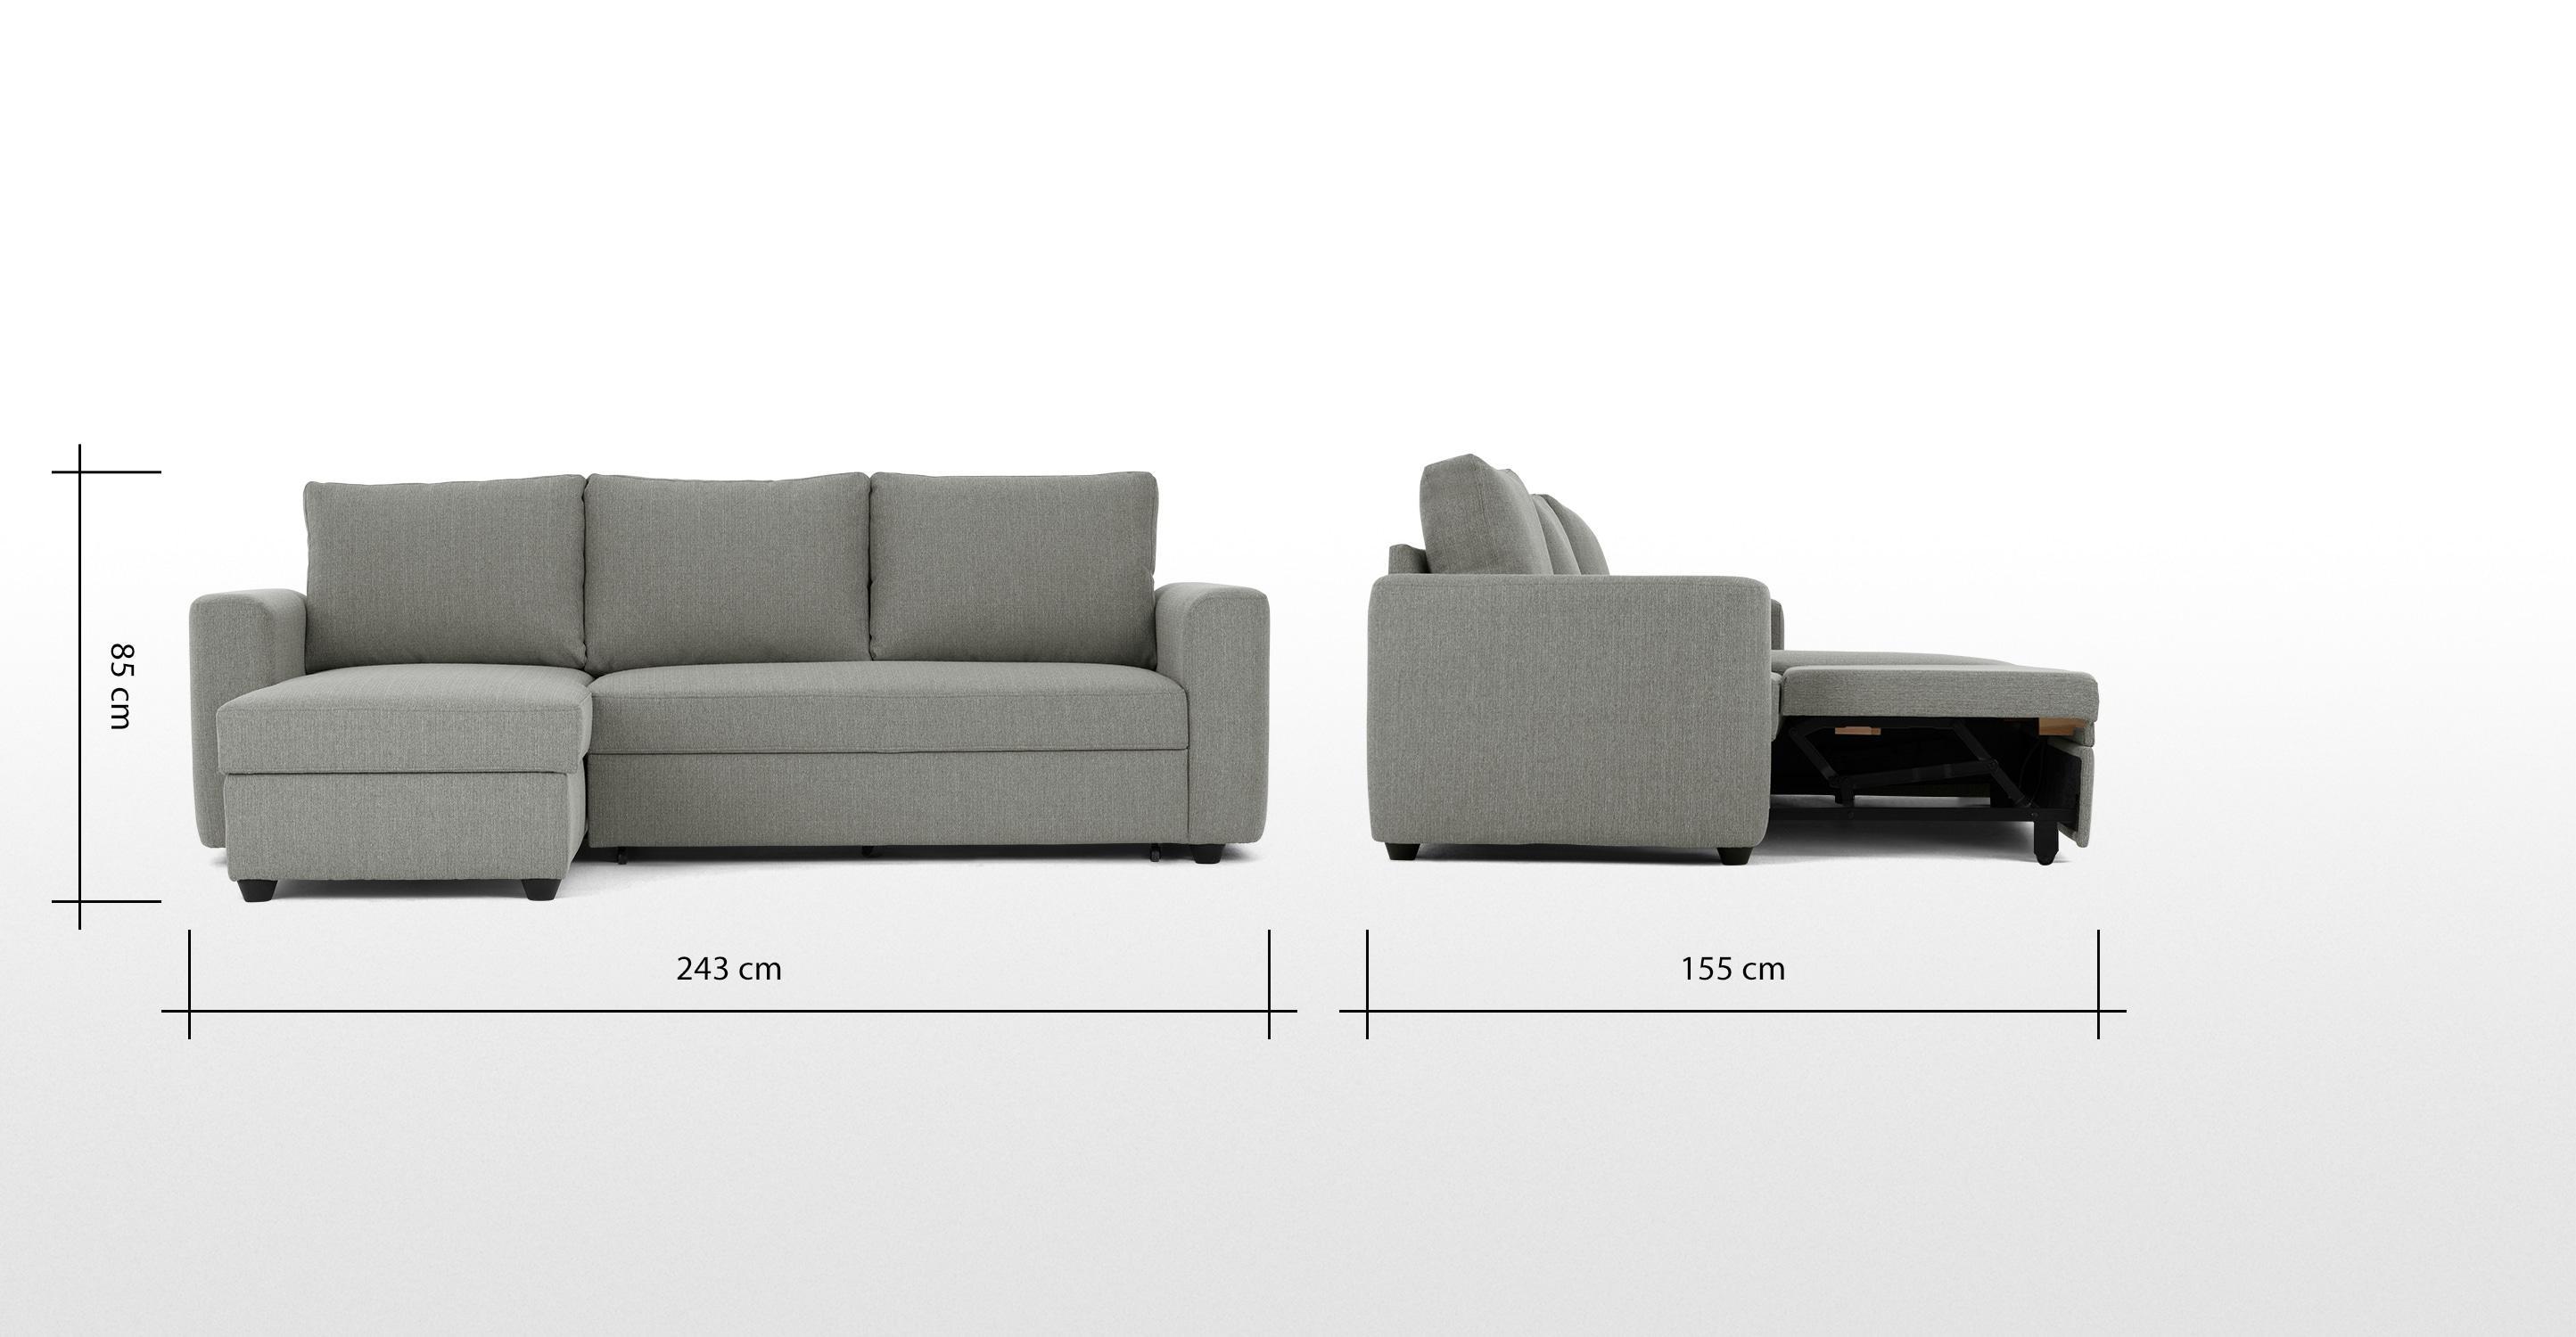 best cheap sofas uk leather sofa sale 20 corner ideas